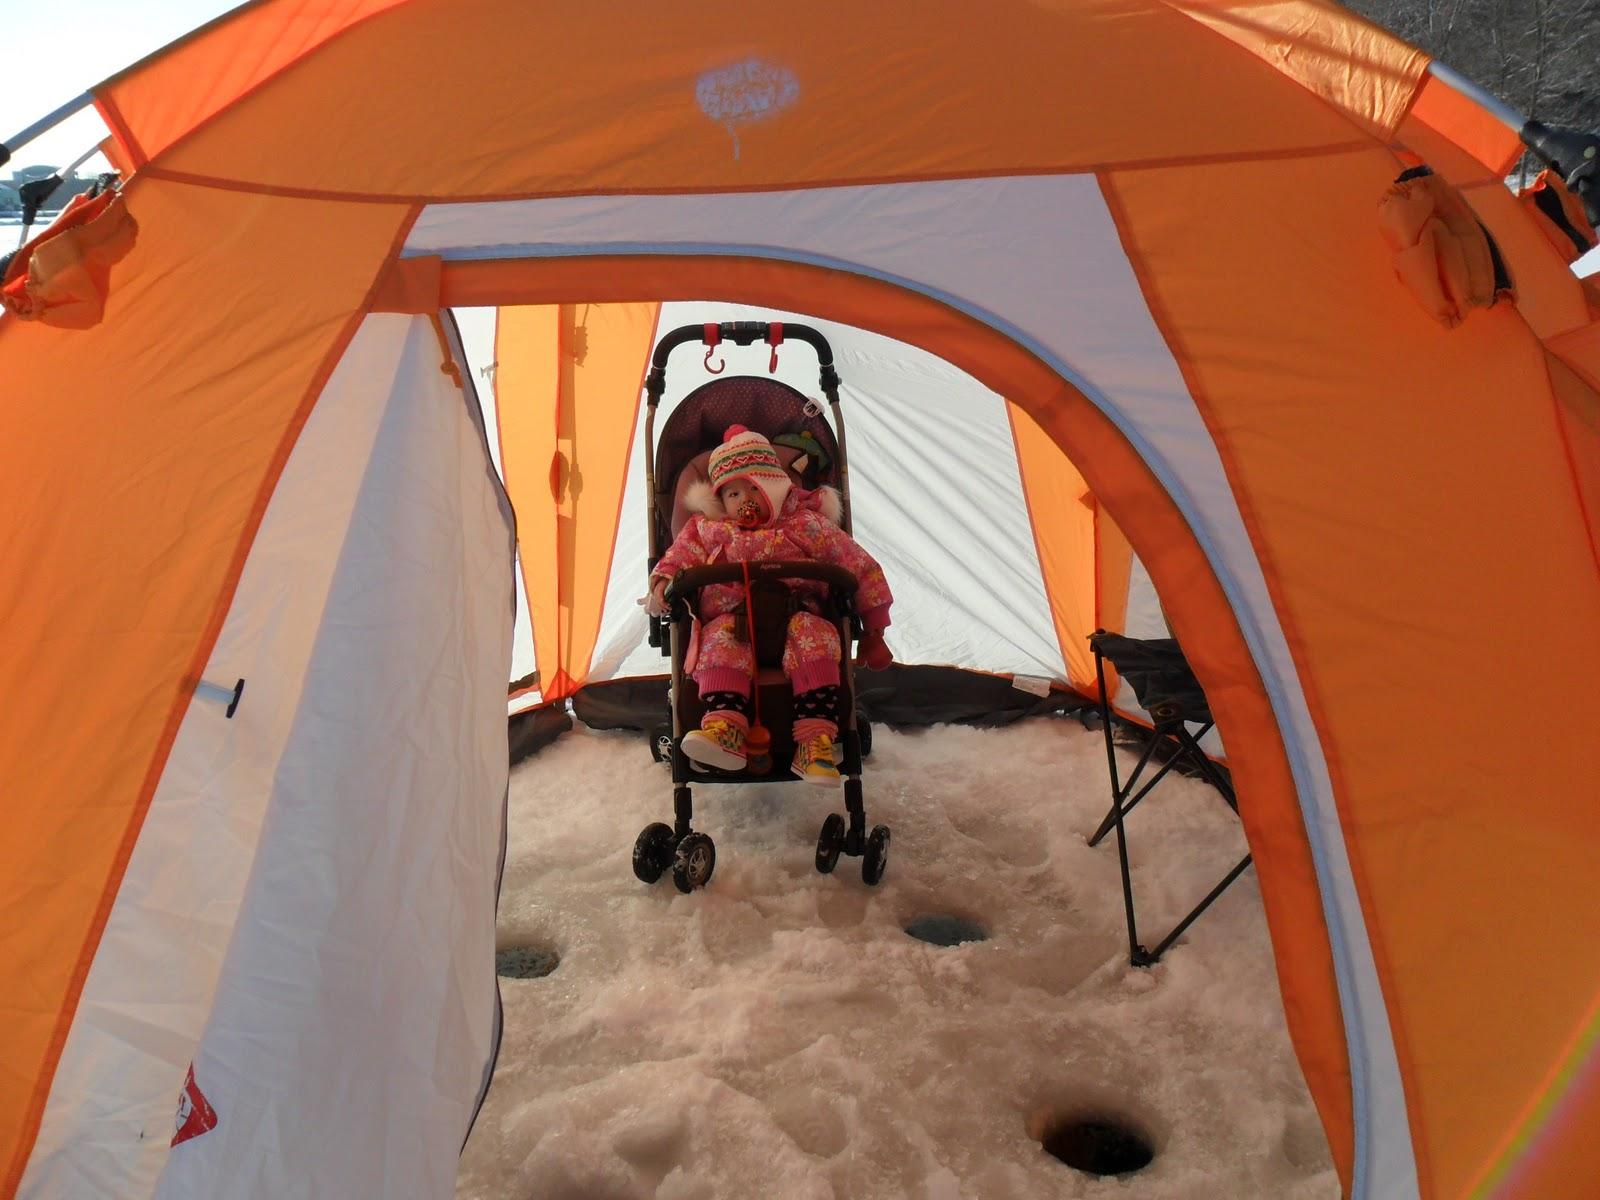 Nico (Keiu0027s daughter) hanging in the tent waiting for fishing to start. & Chopsticks u0026 Hockeysticks: We went ?? (Ice Fishing)!!!!